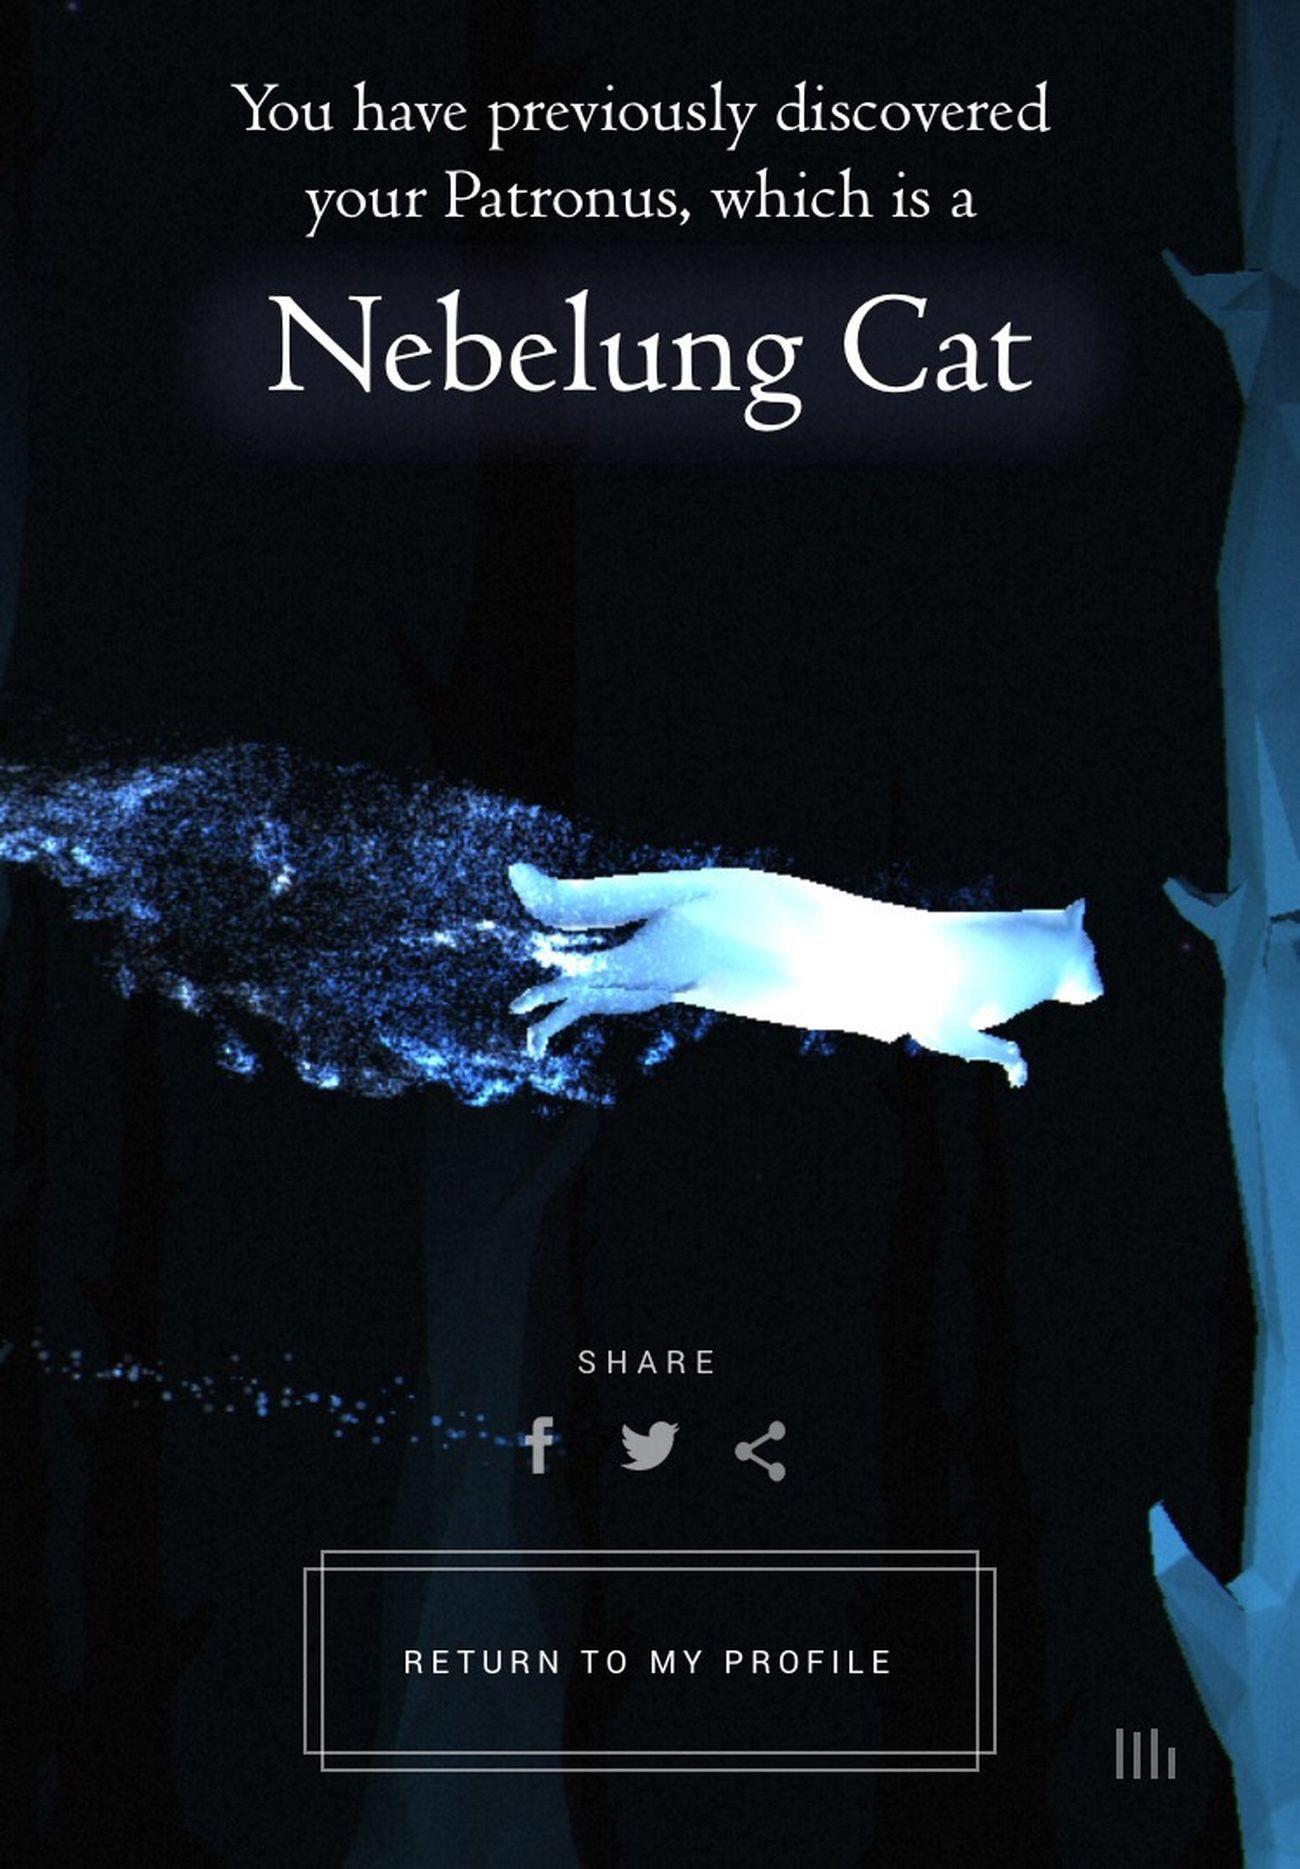 Patronus Harrypotter Harry Potter HP Harry Potter ❤ Blue Black Cat Nebelungcat Love Addmeonsnapchat lifewithlorena POTD Nice Gryffindor Snapchat Me lifewithlorena Germany Snapchat lifewithlorena Follow